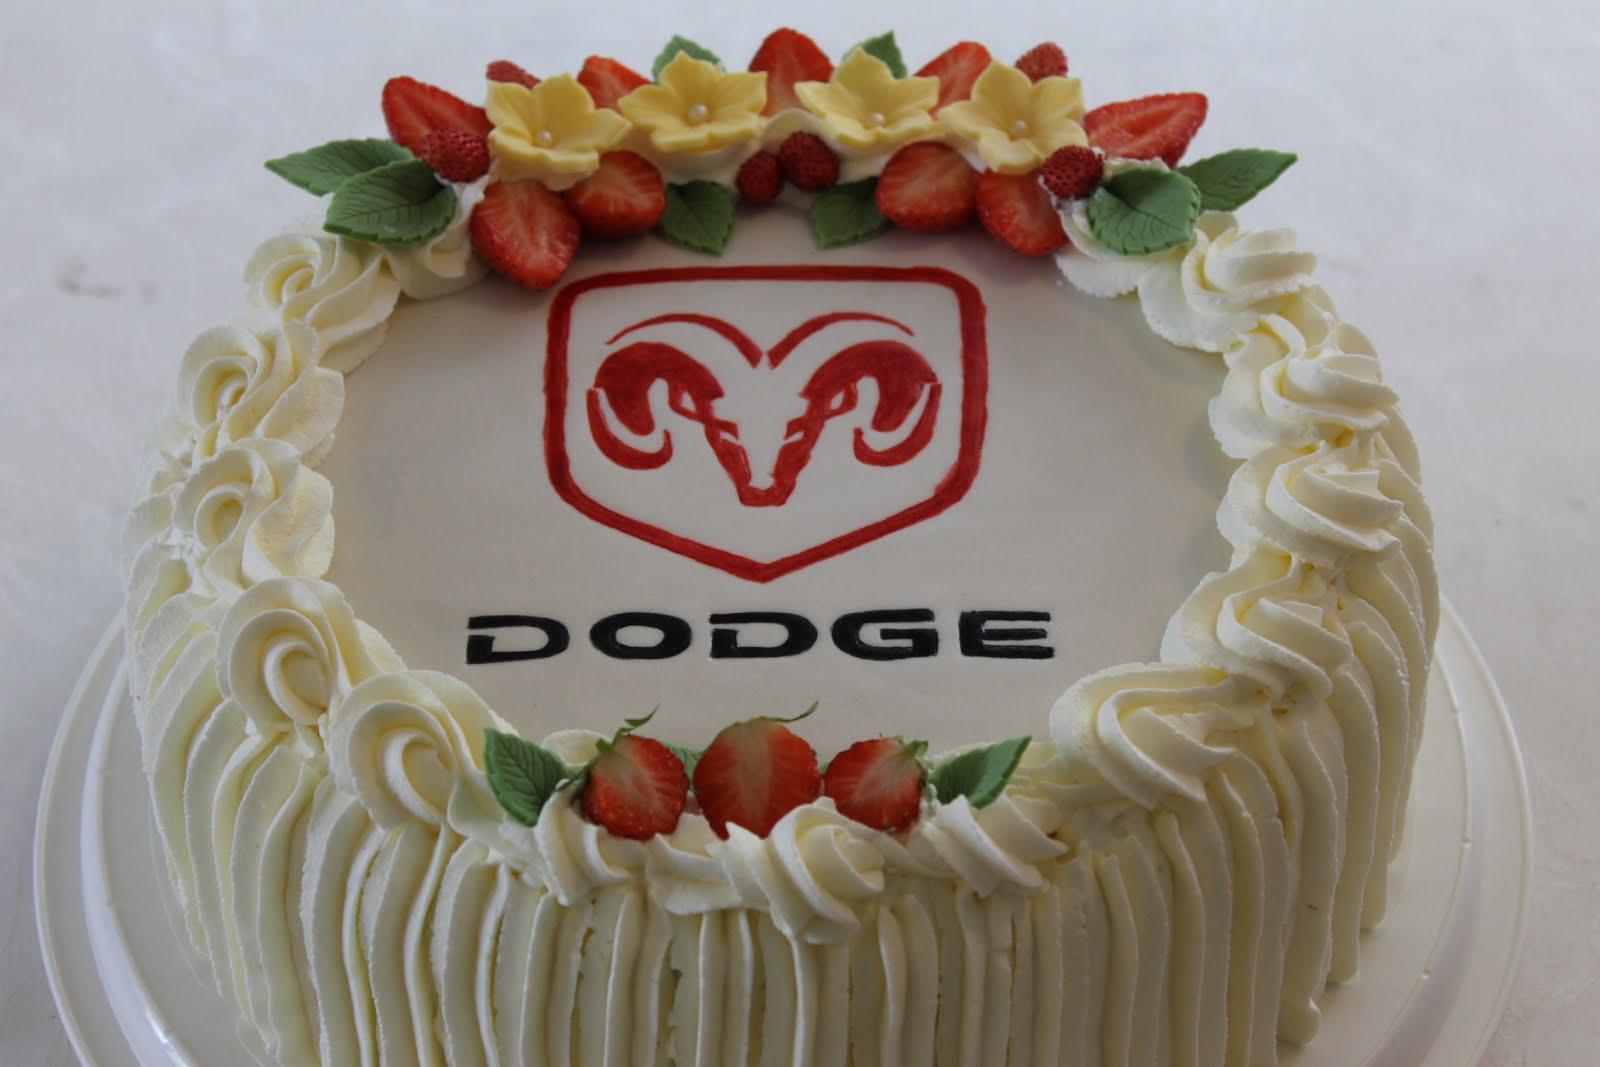 Dodge-täytekakku